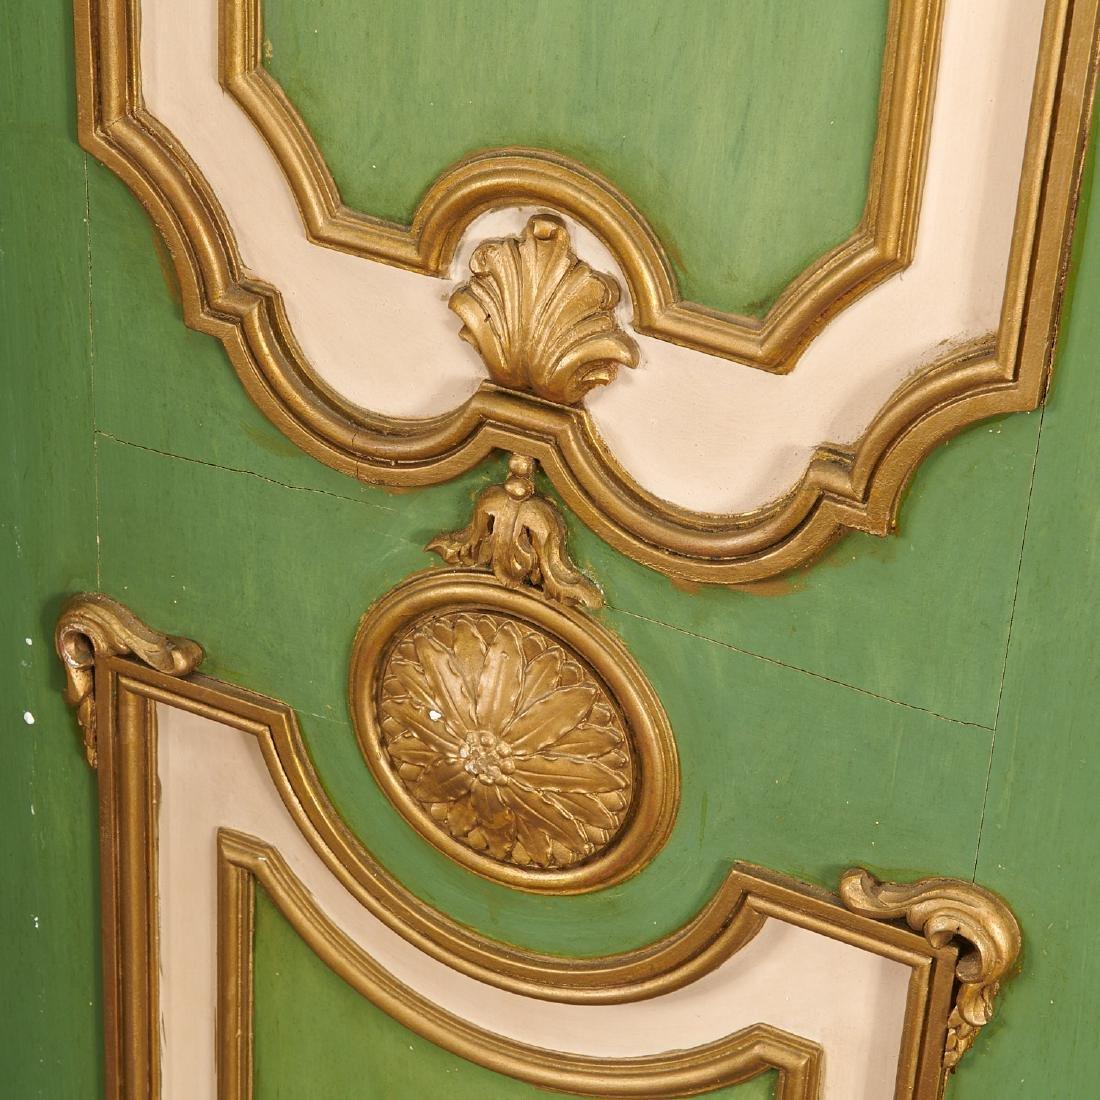 Signed Maison Jansen Louis XVI four-panel screen - 4